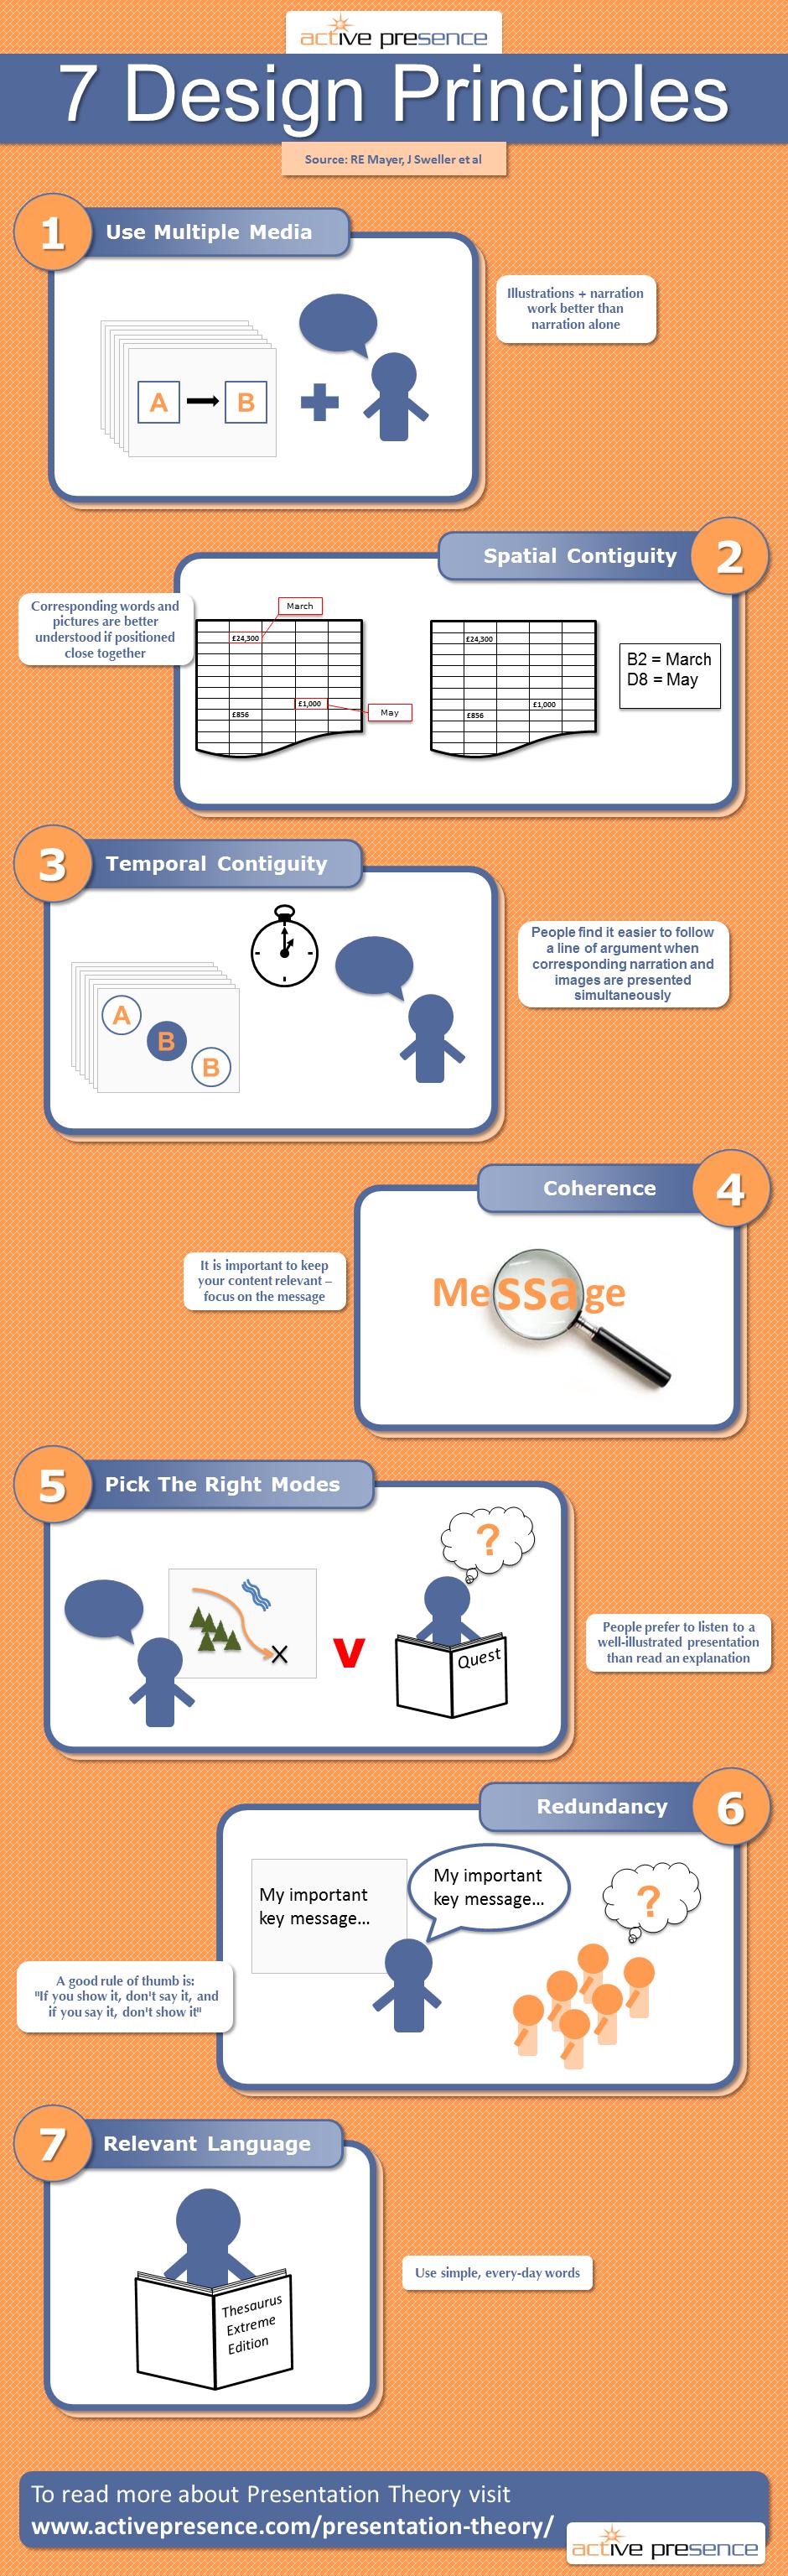 Seven Design Principles